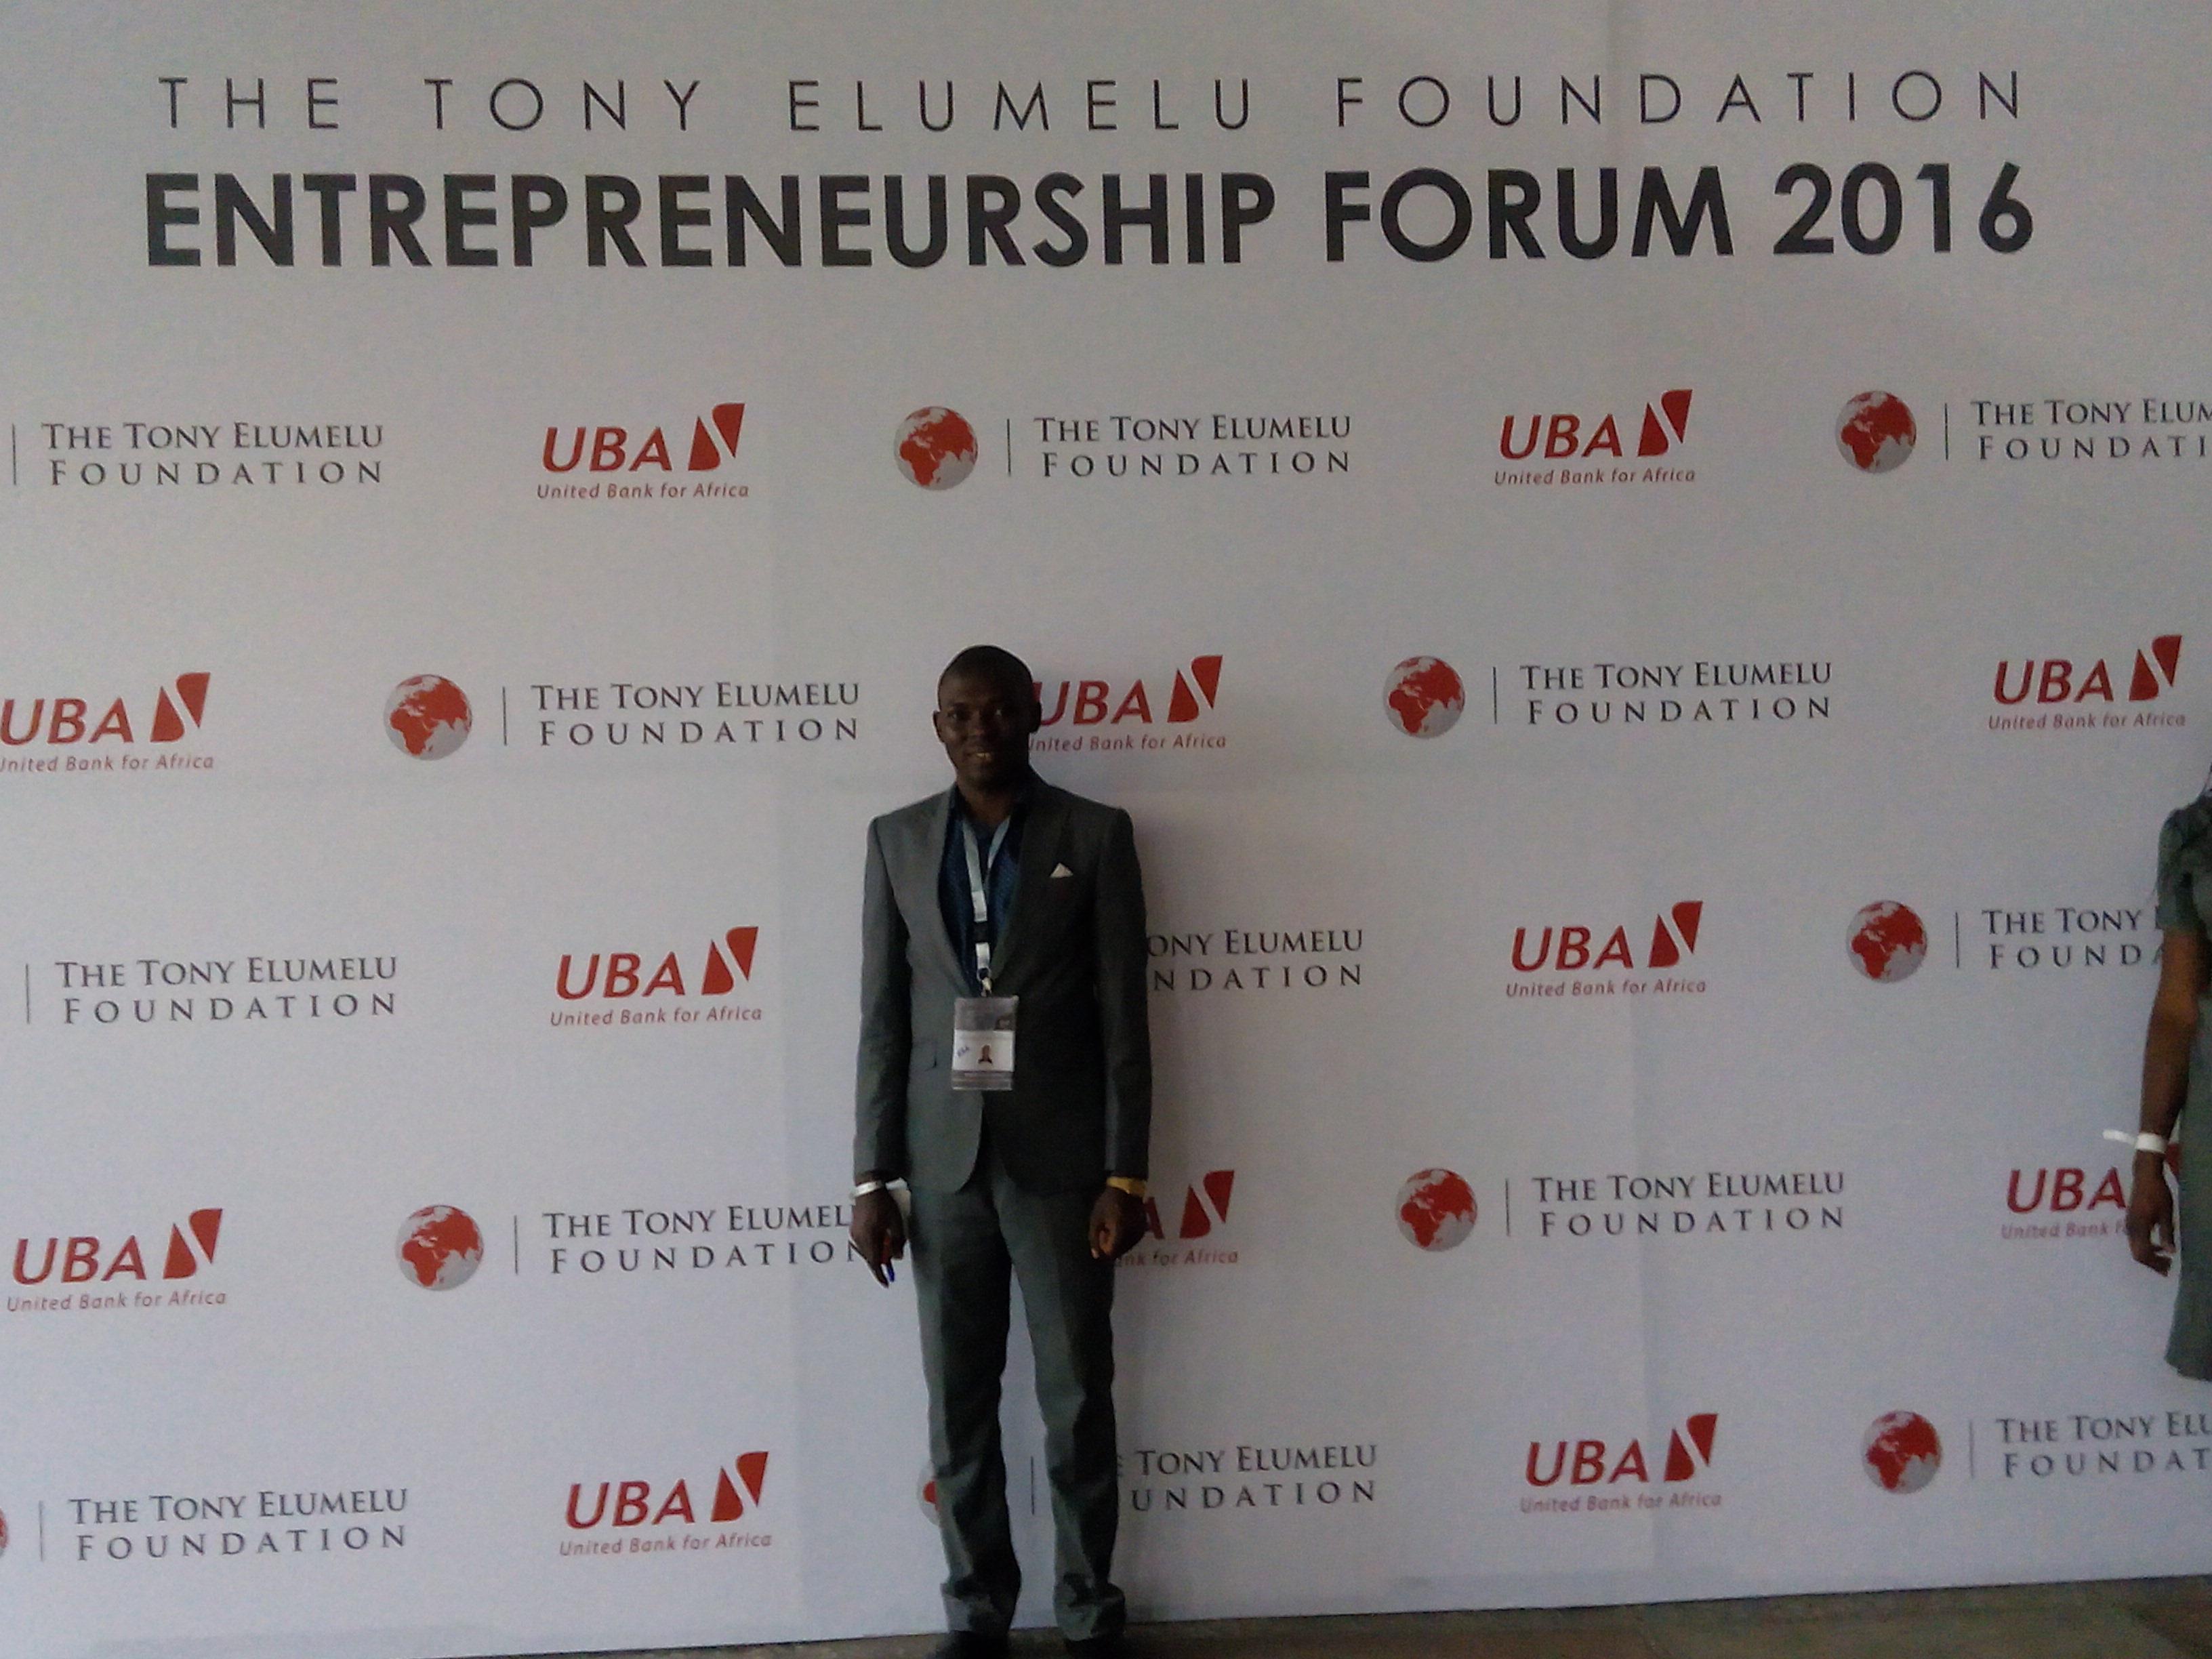 9-tony-elumelu-entrepreneurship-forum-2016